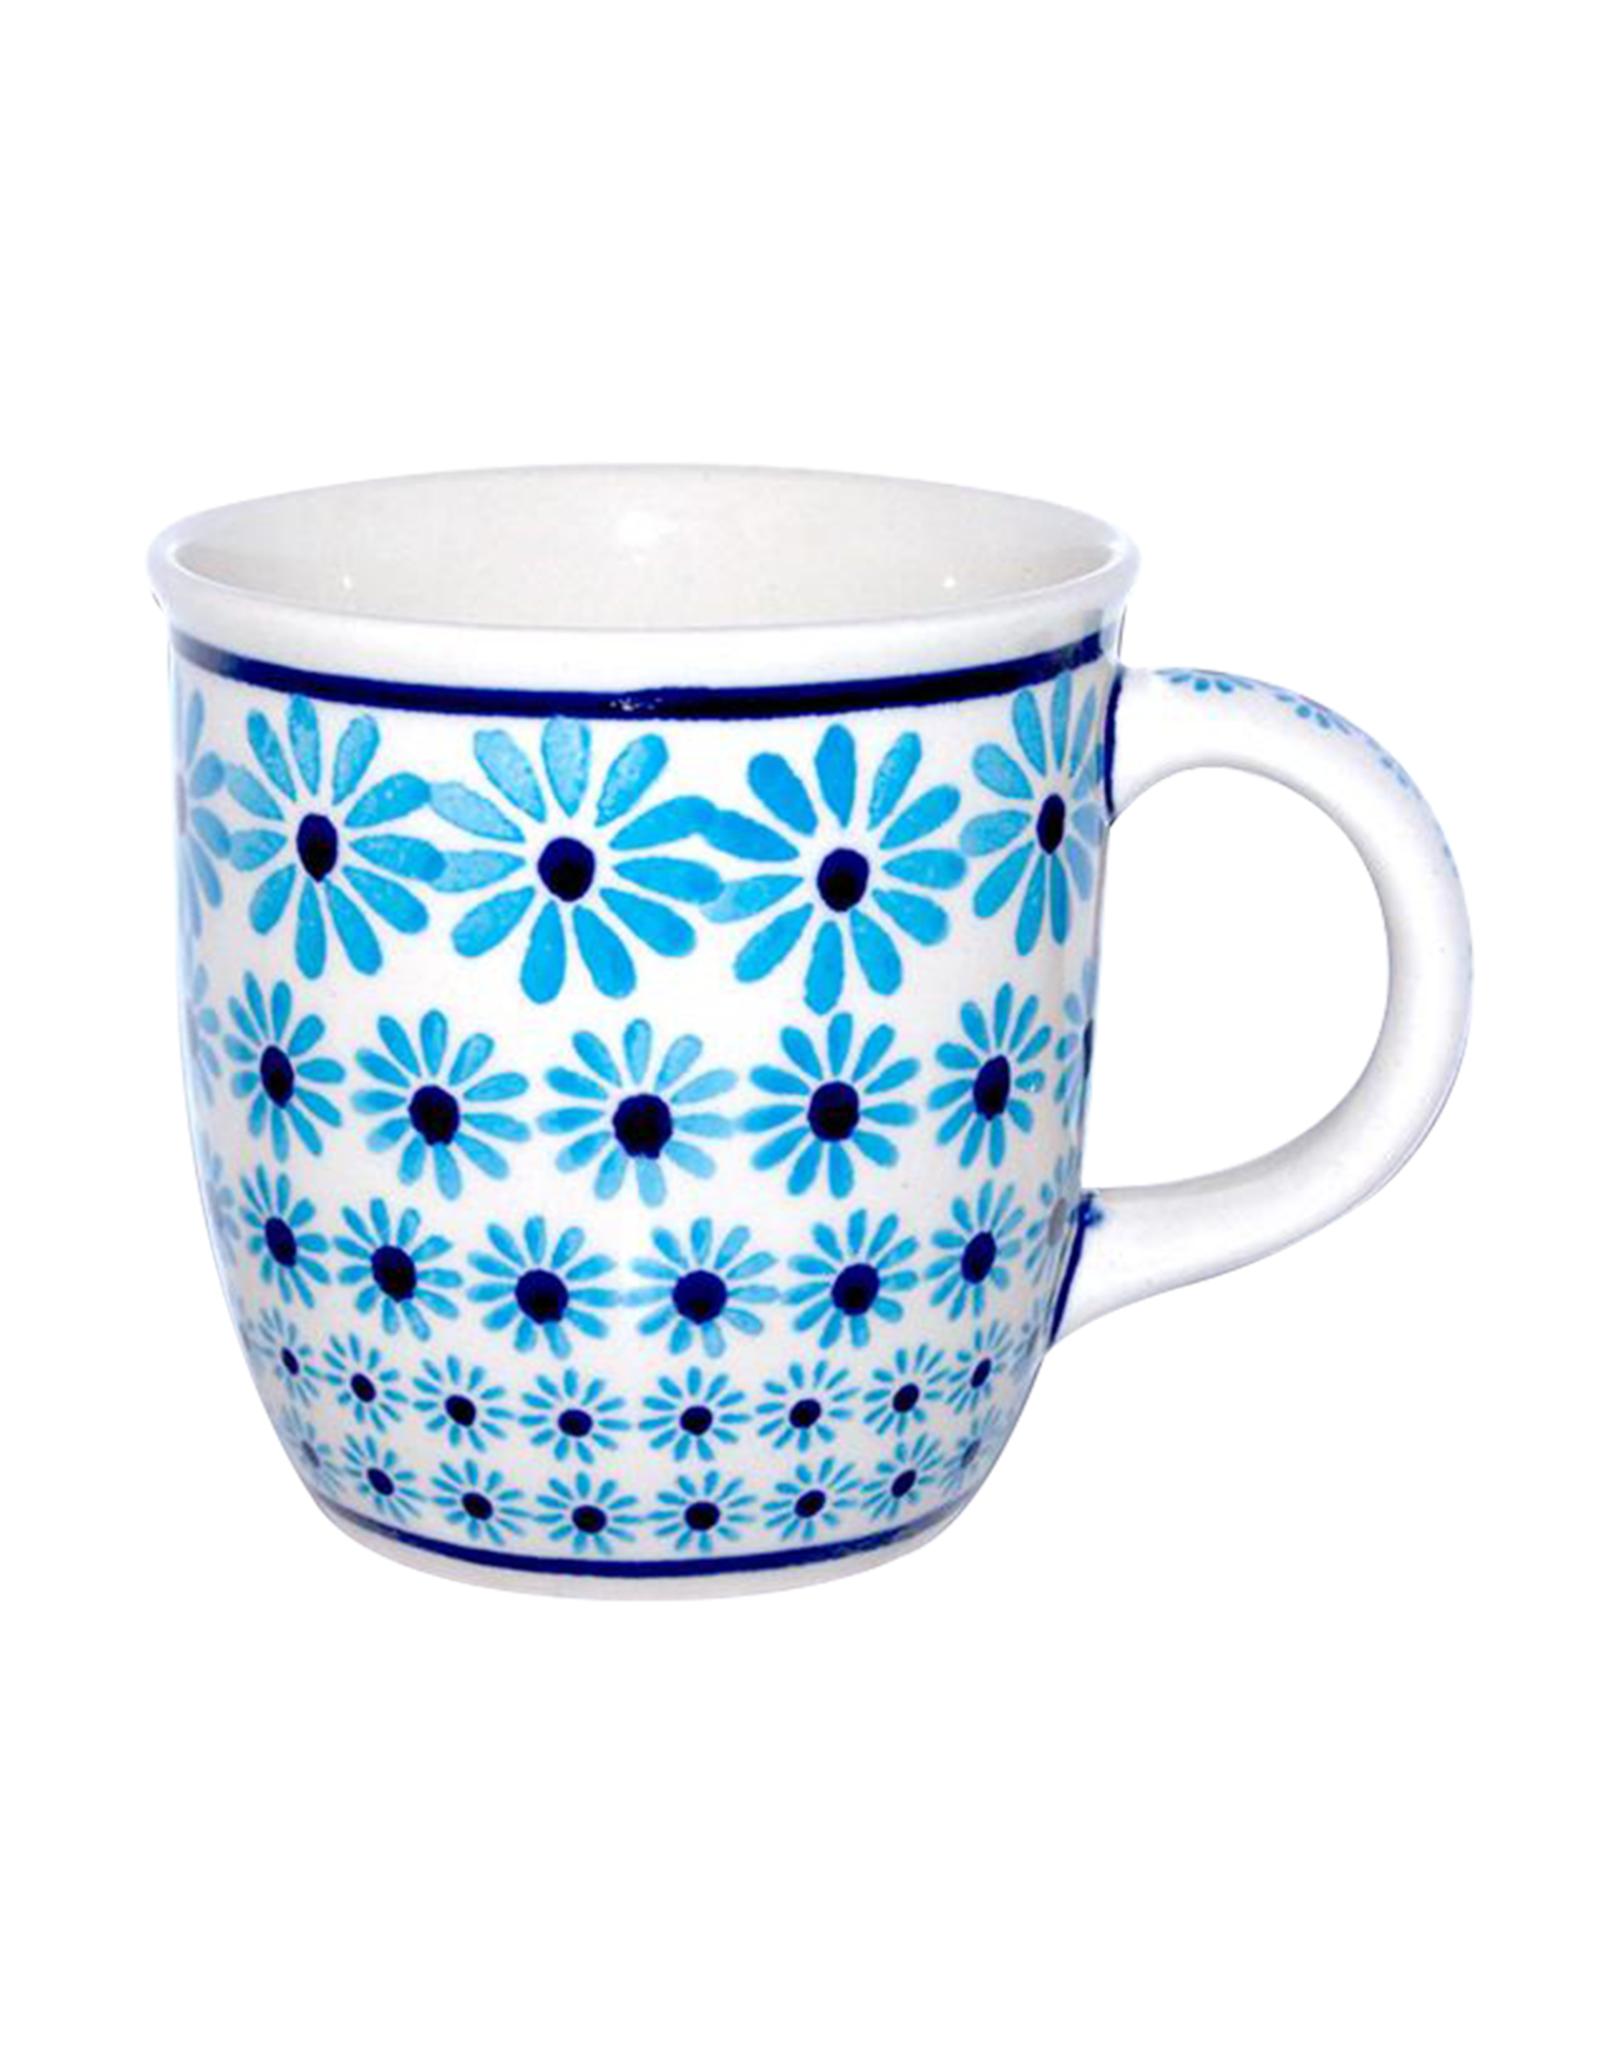 Mug - Turquois Flowers